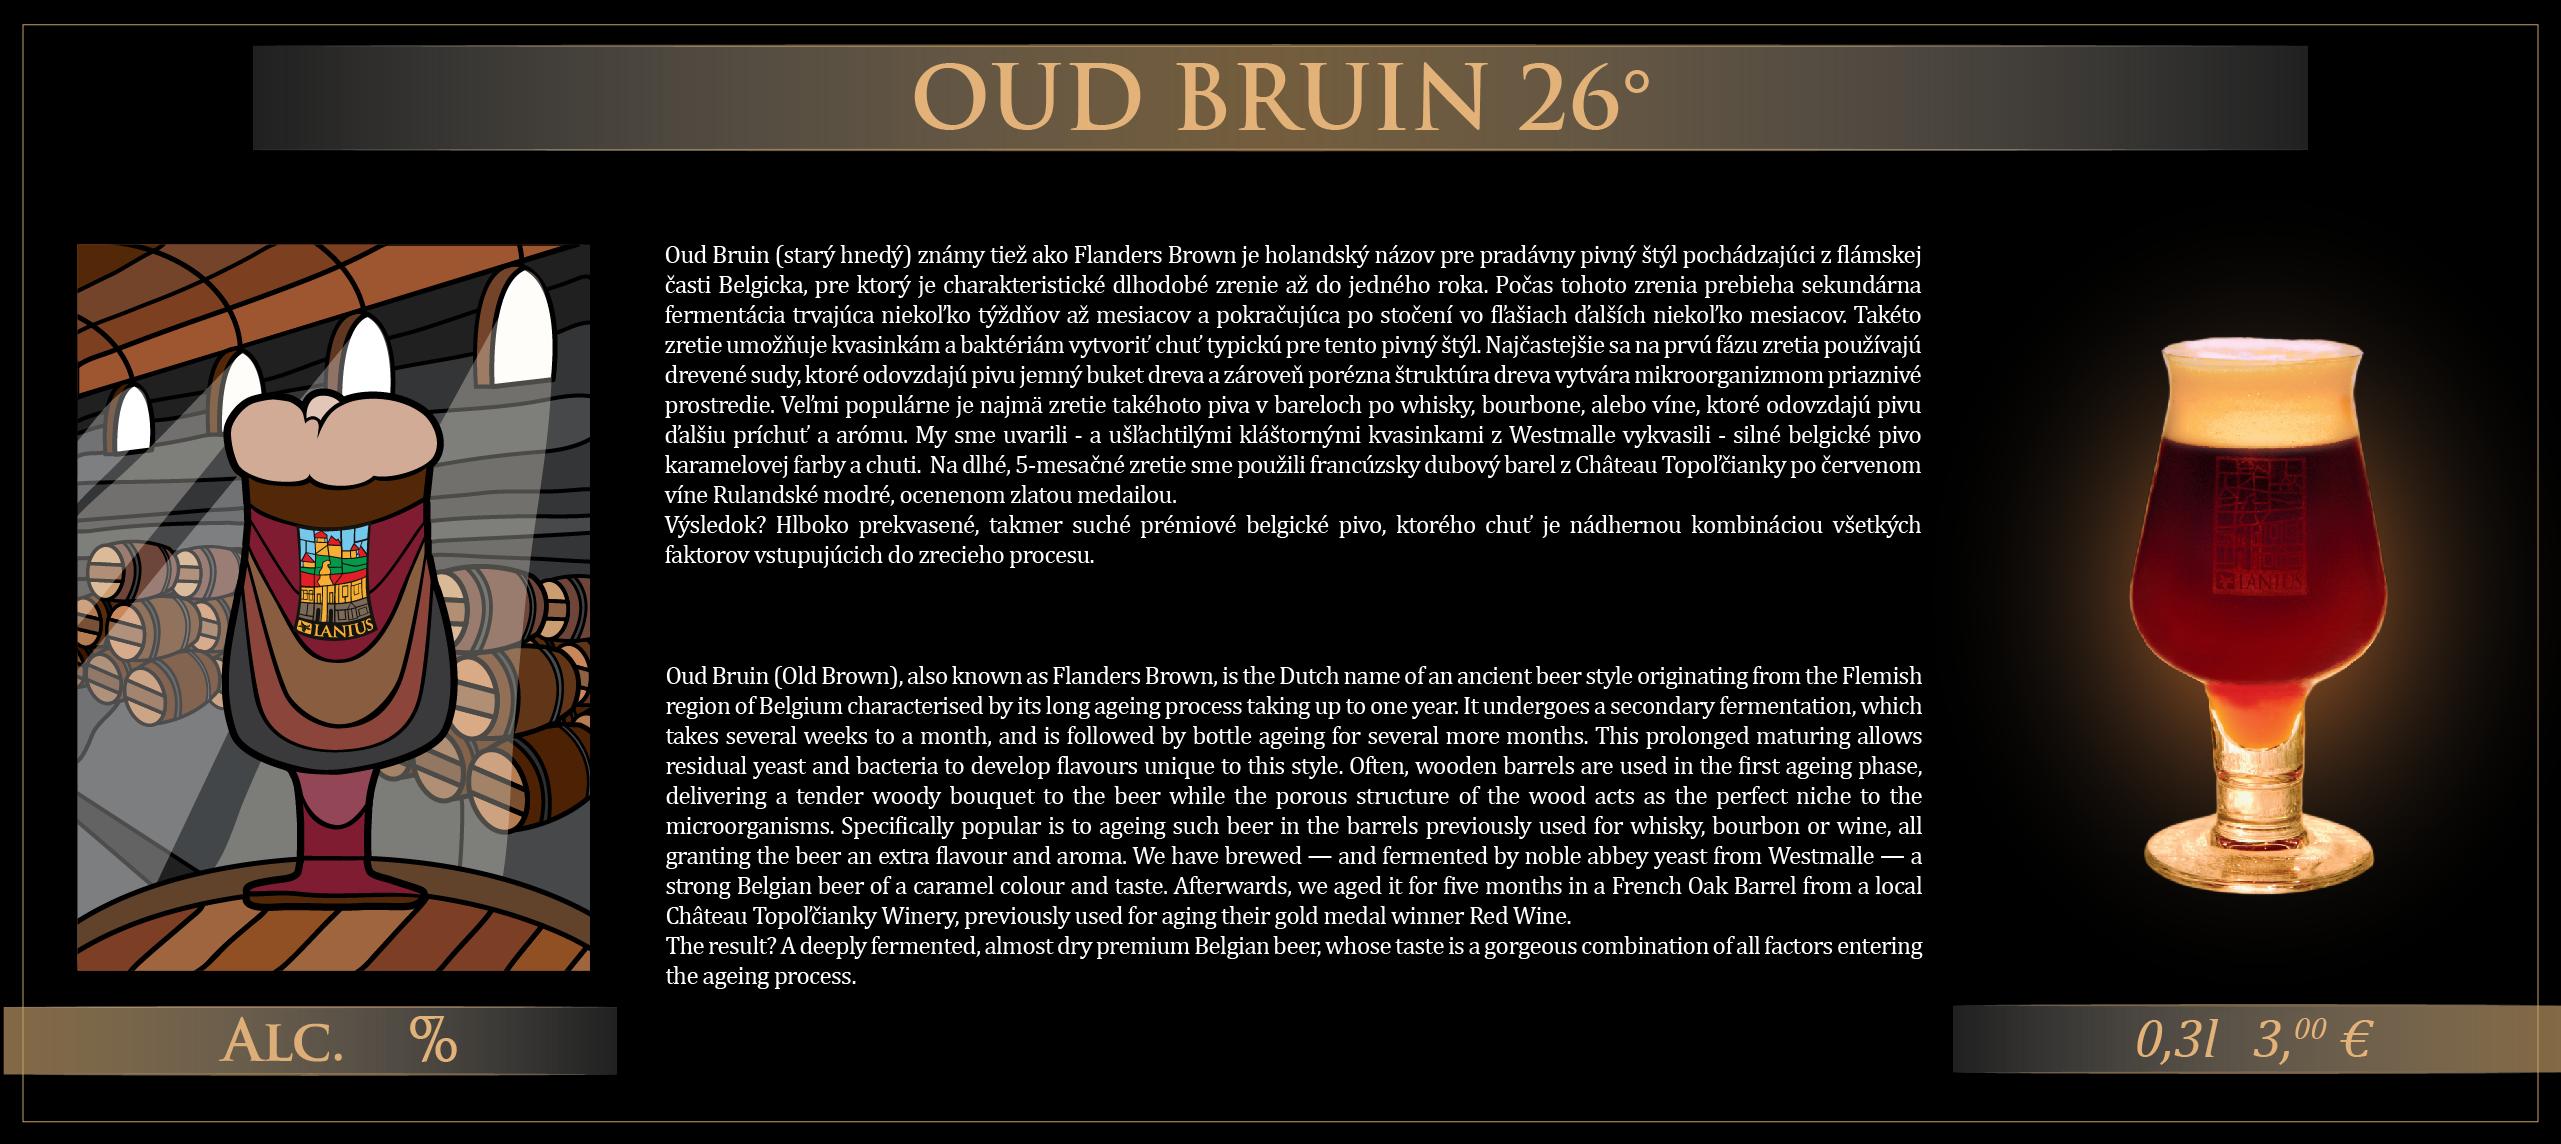 Oud bruin_26-04